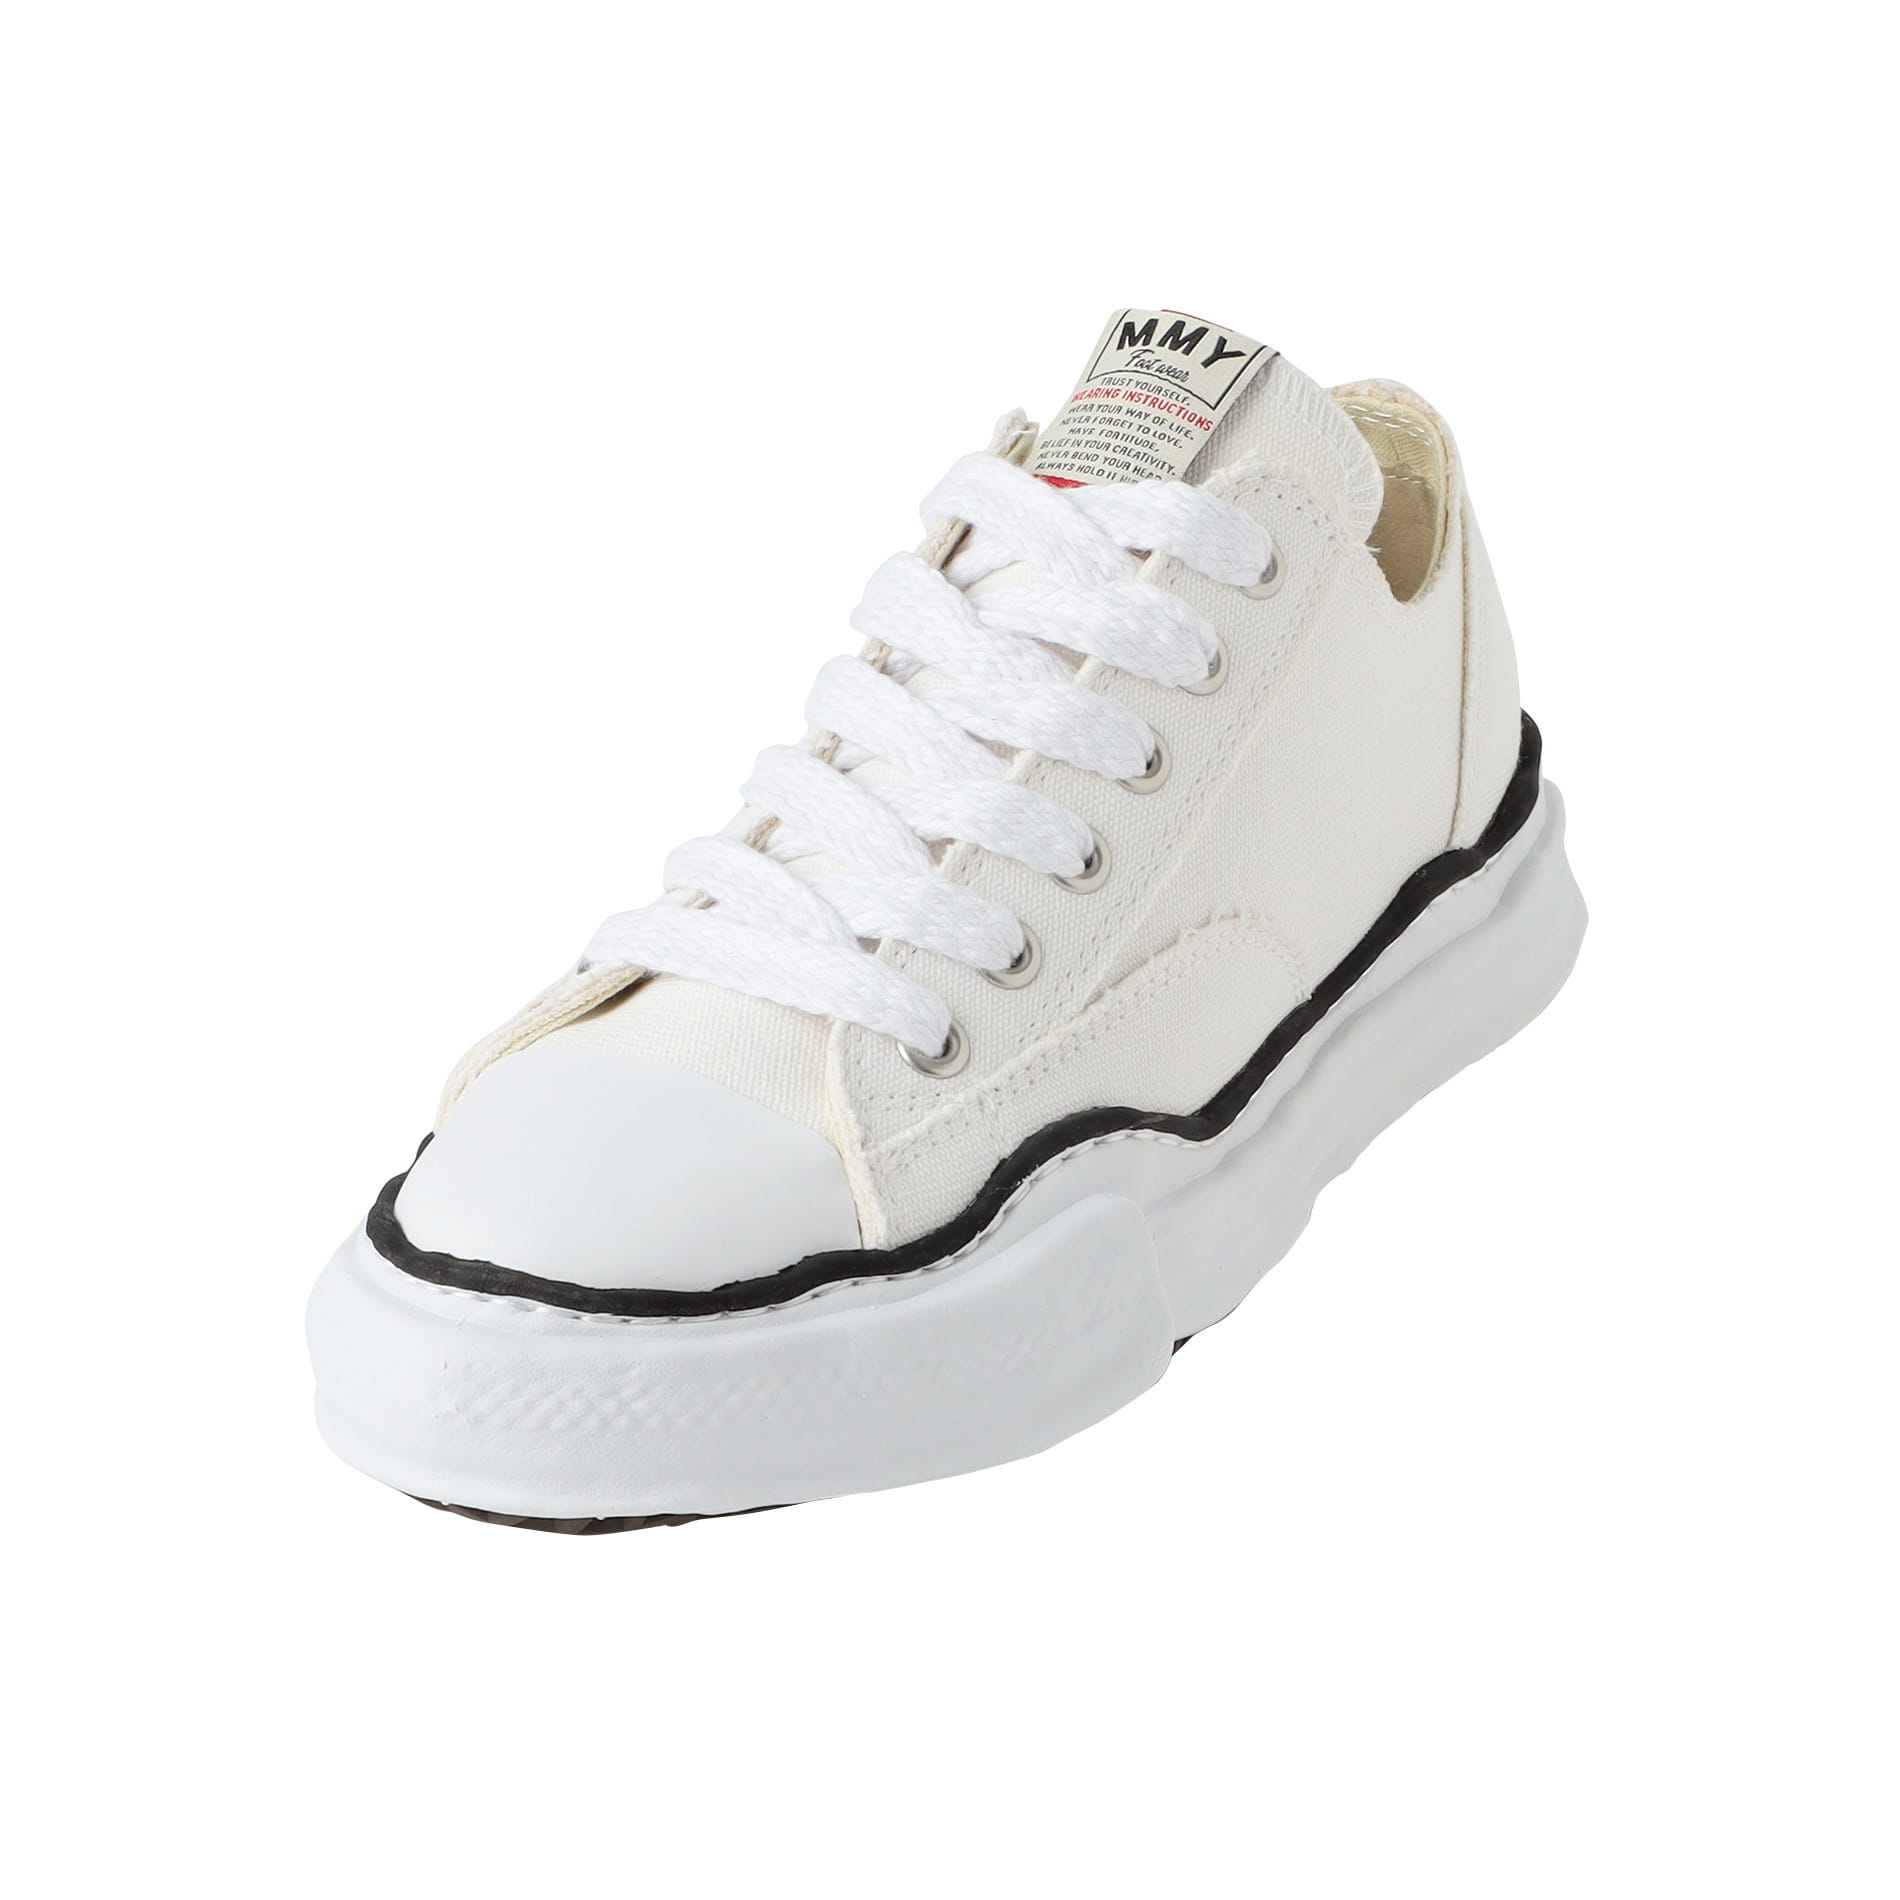 【Maison MIHARA YASUHIRO】MEN スニーカー original sole canvas lowcut sneaker A01FW702